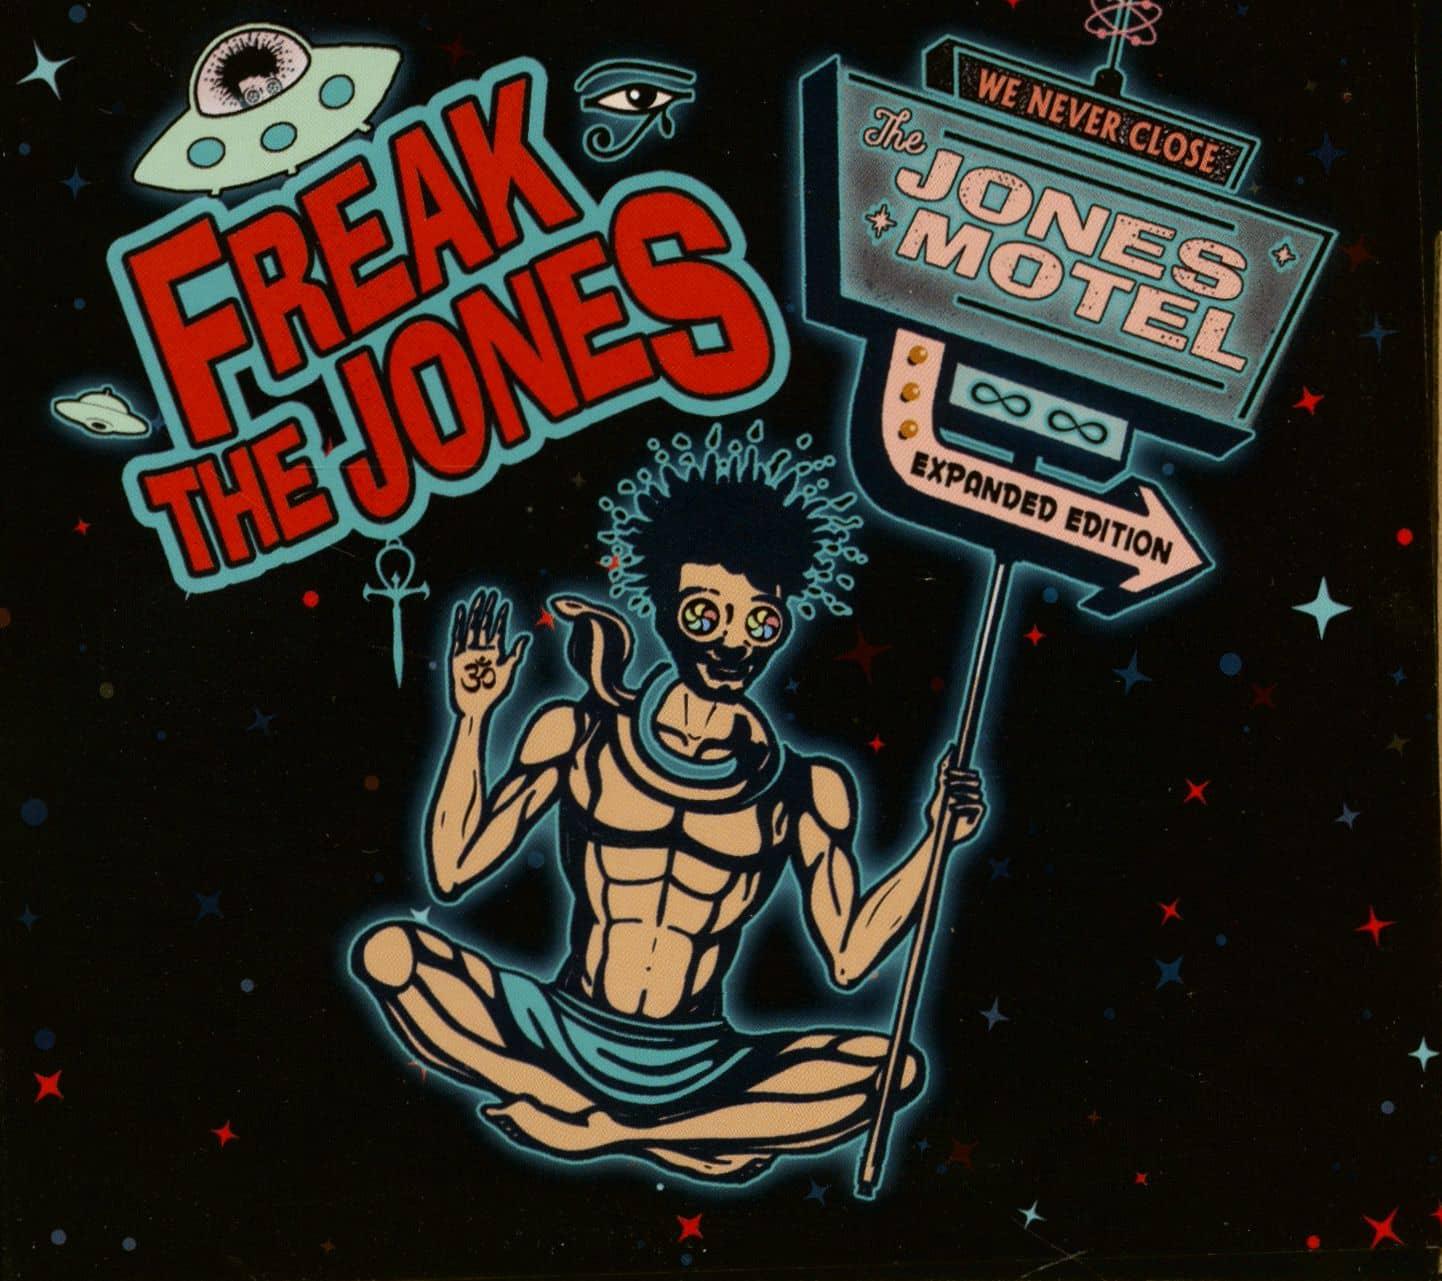 Freak The Jones CD: The Jones Motel